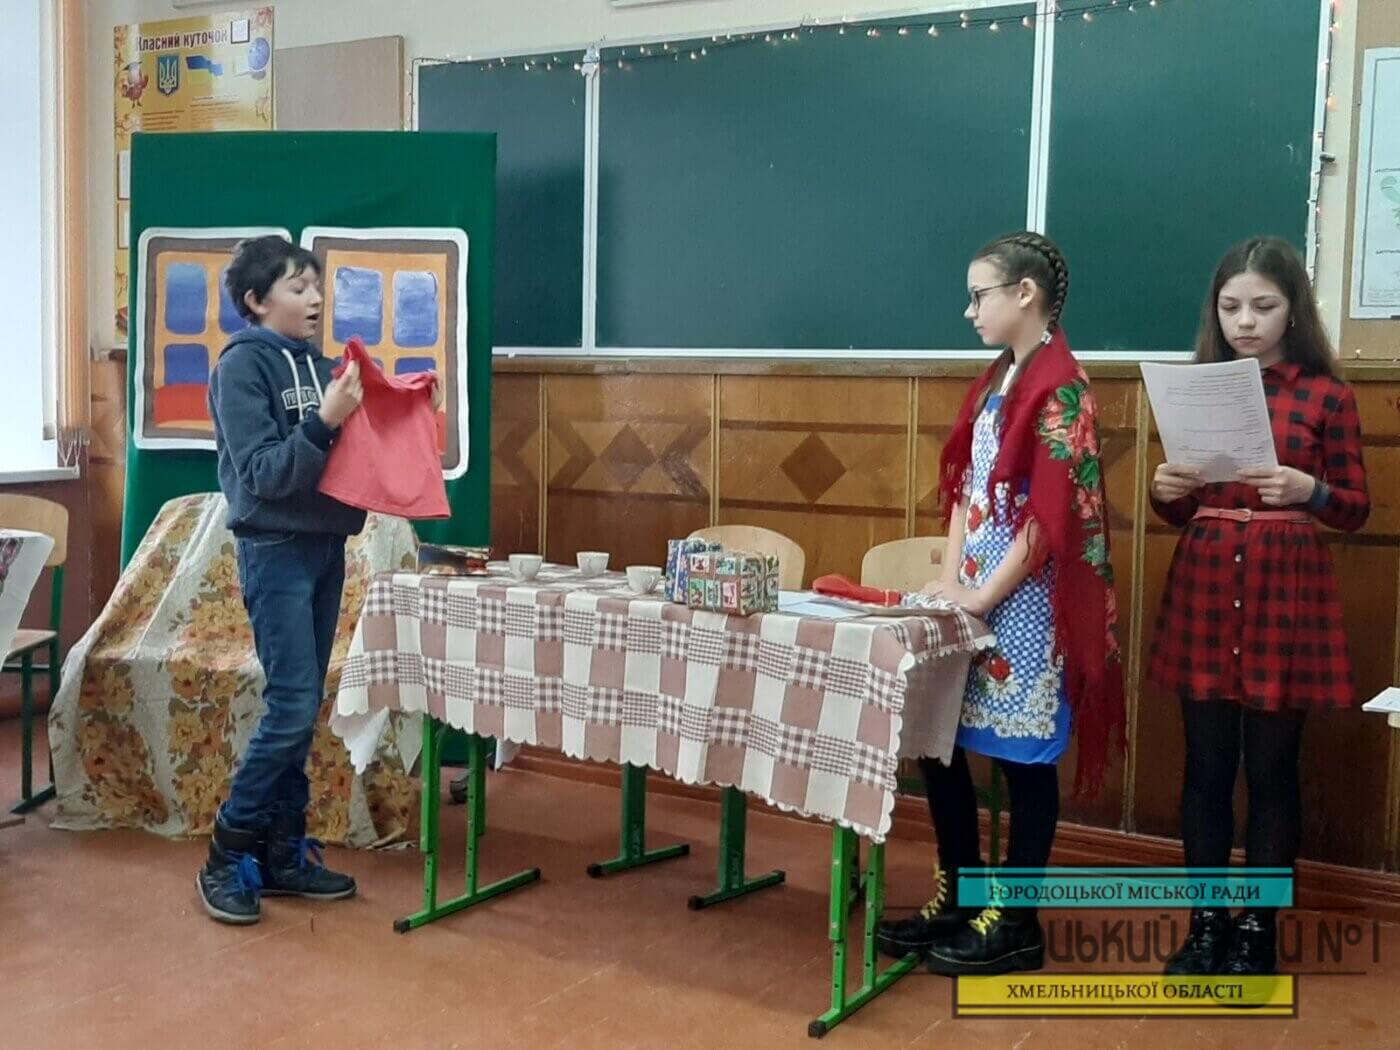 zobrazhennya viber 2020 12 28 21 43 22 1400x1050 - Театральний гурток «Сяйво»